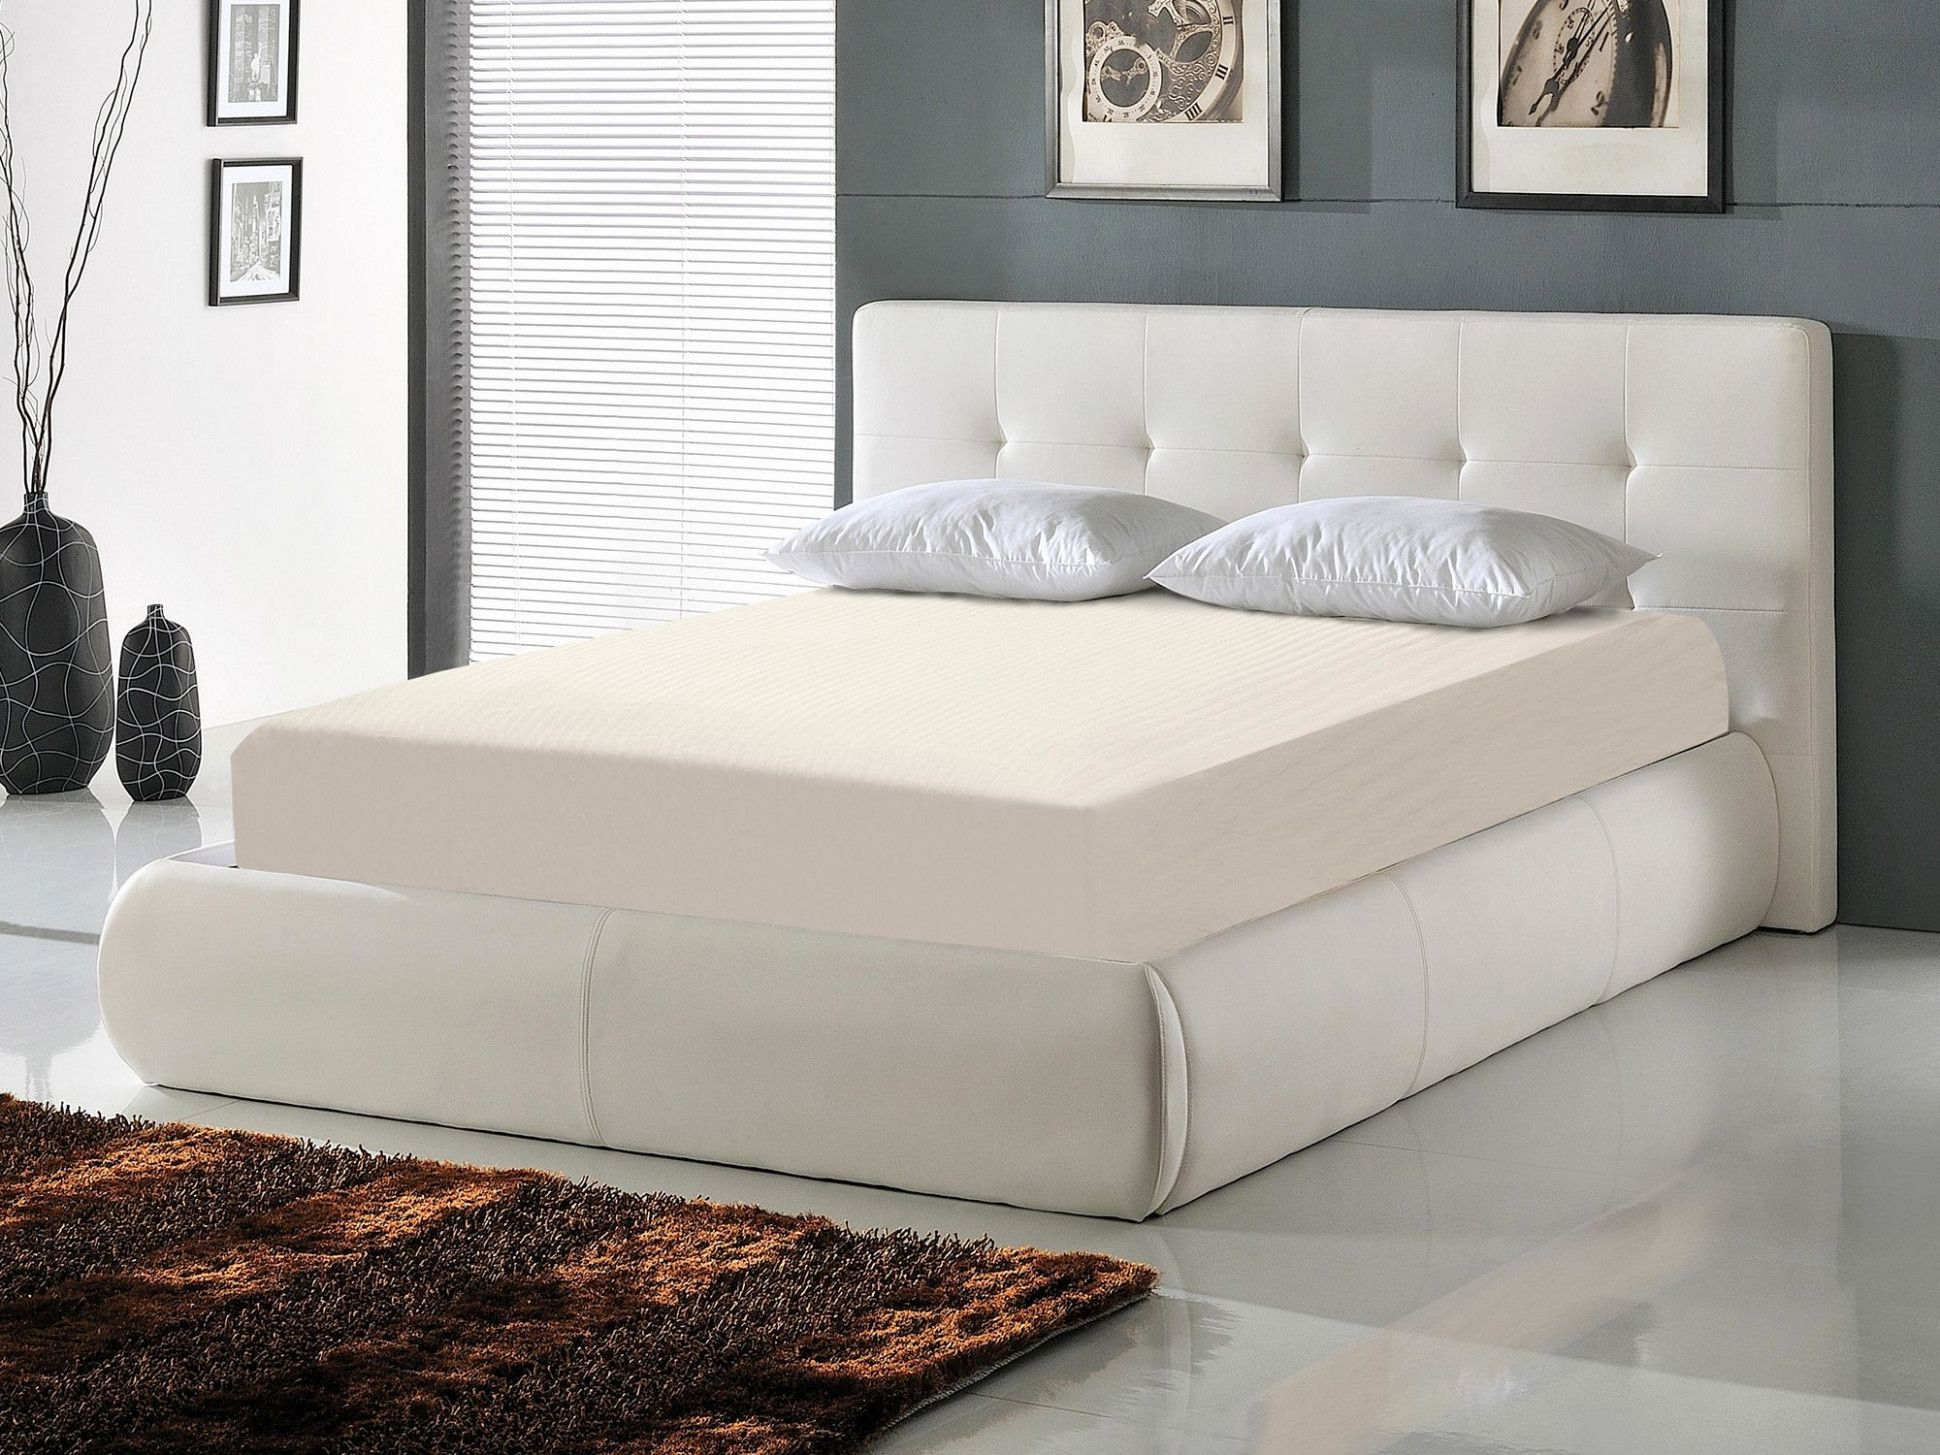 10 Meilleur Lit Avec Rangement Conforama In 2020 Home N Decor Ikea Home Decor